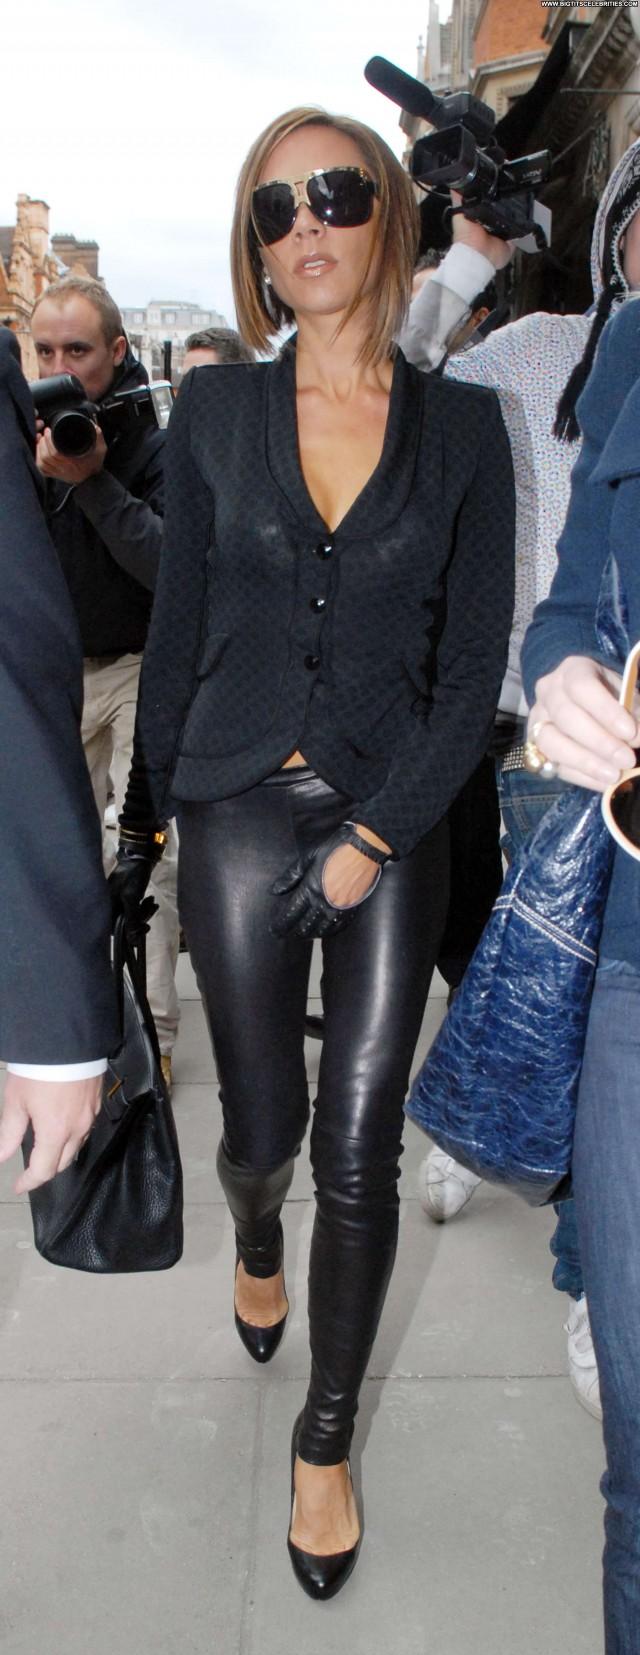 Victoria Beckham No Source Beautiful Babe Pants Posing Hot Celebrity